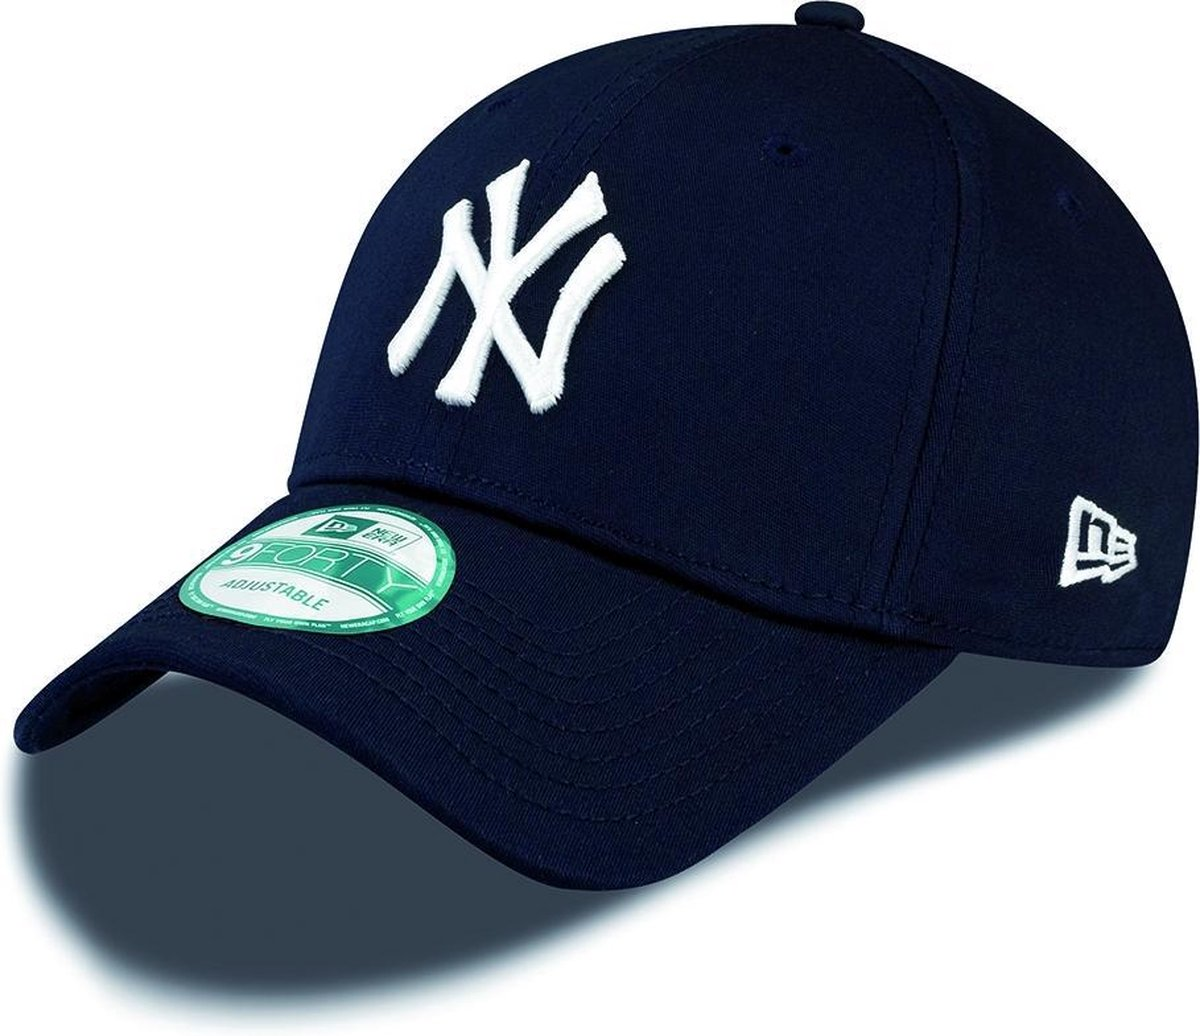 New Era 940 LEAG BASIC New York Yankees Cap - Navy - One size